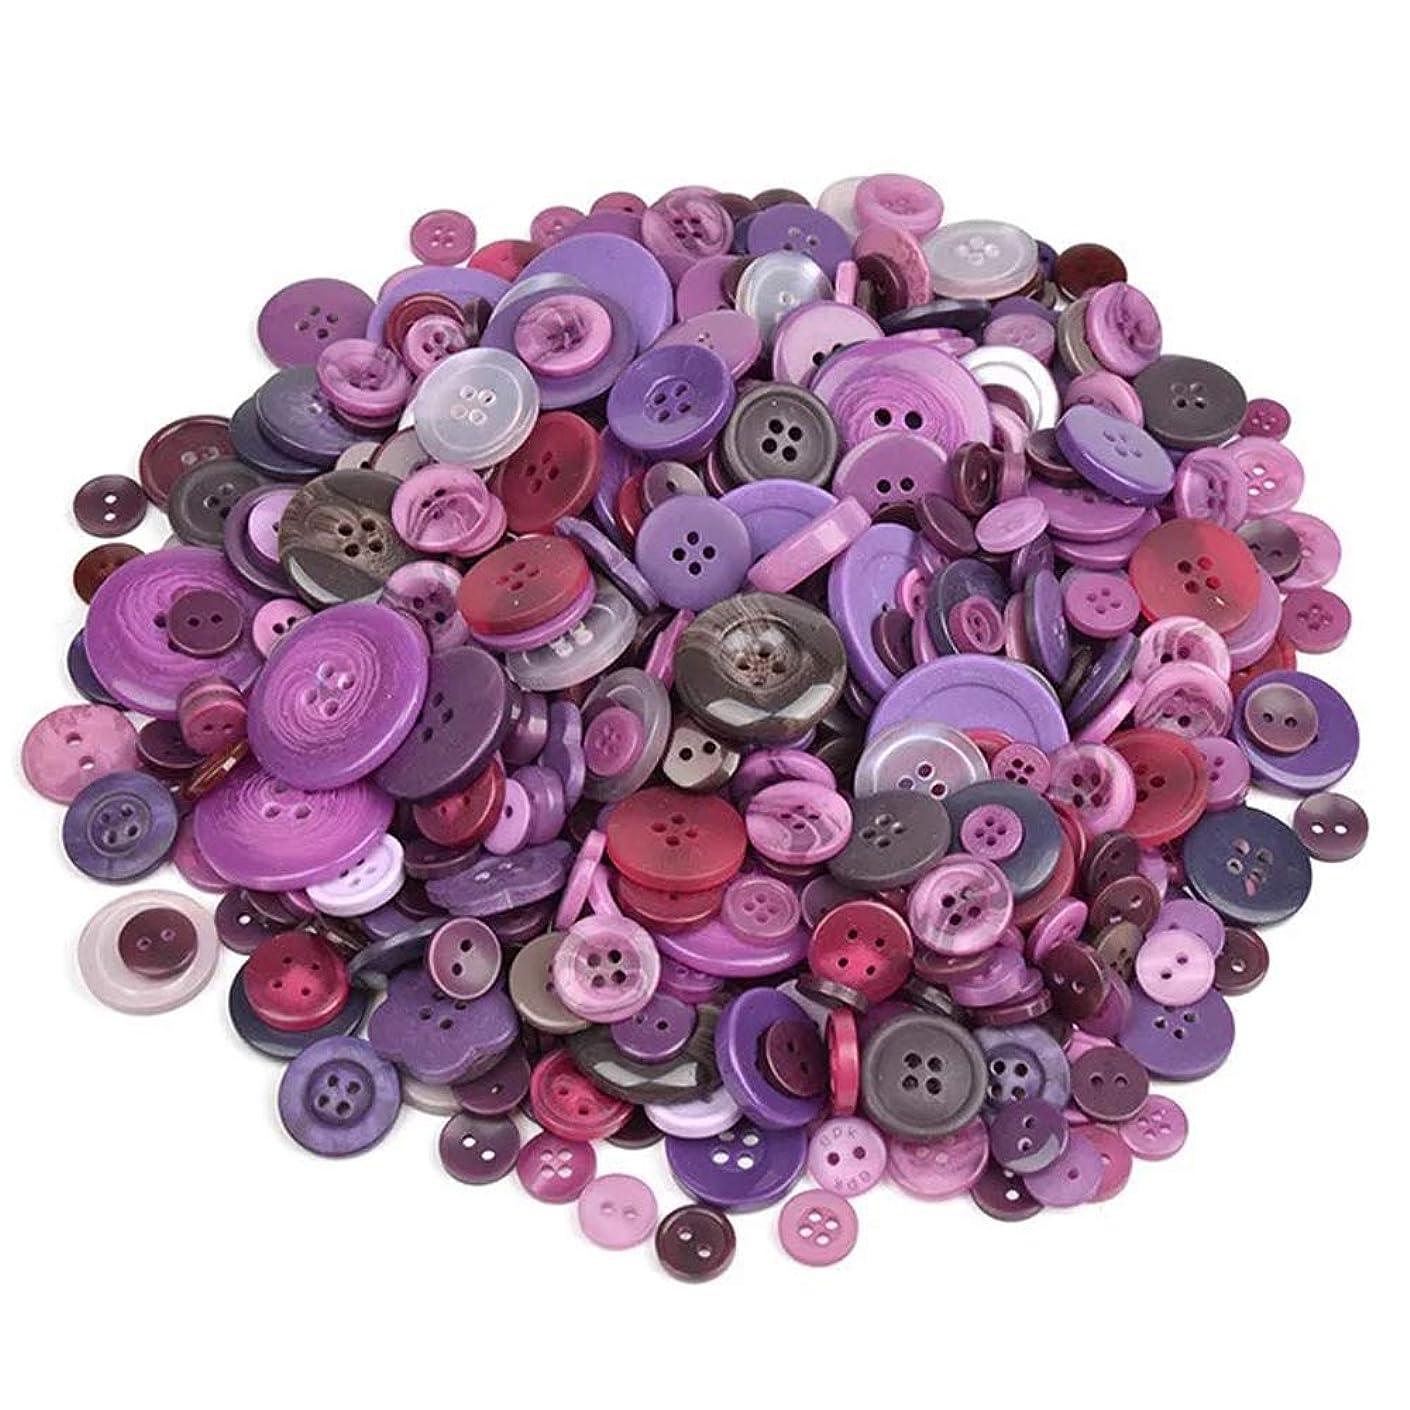 HanYoer 600 Pcs Buttons DIY Crafts Children's Manual Button Painting 4 Holes Buttons DIY Handmade Ornament (Purple)